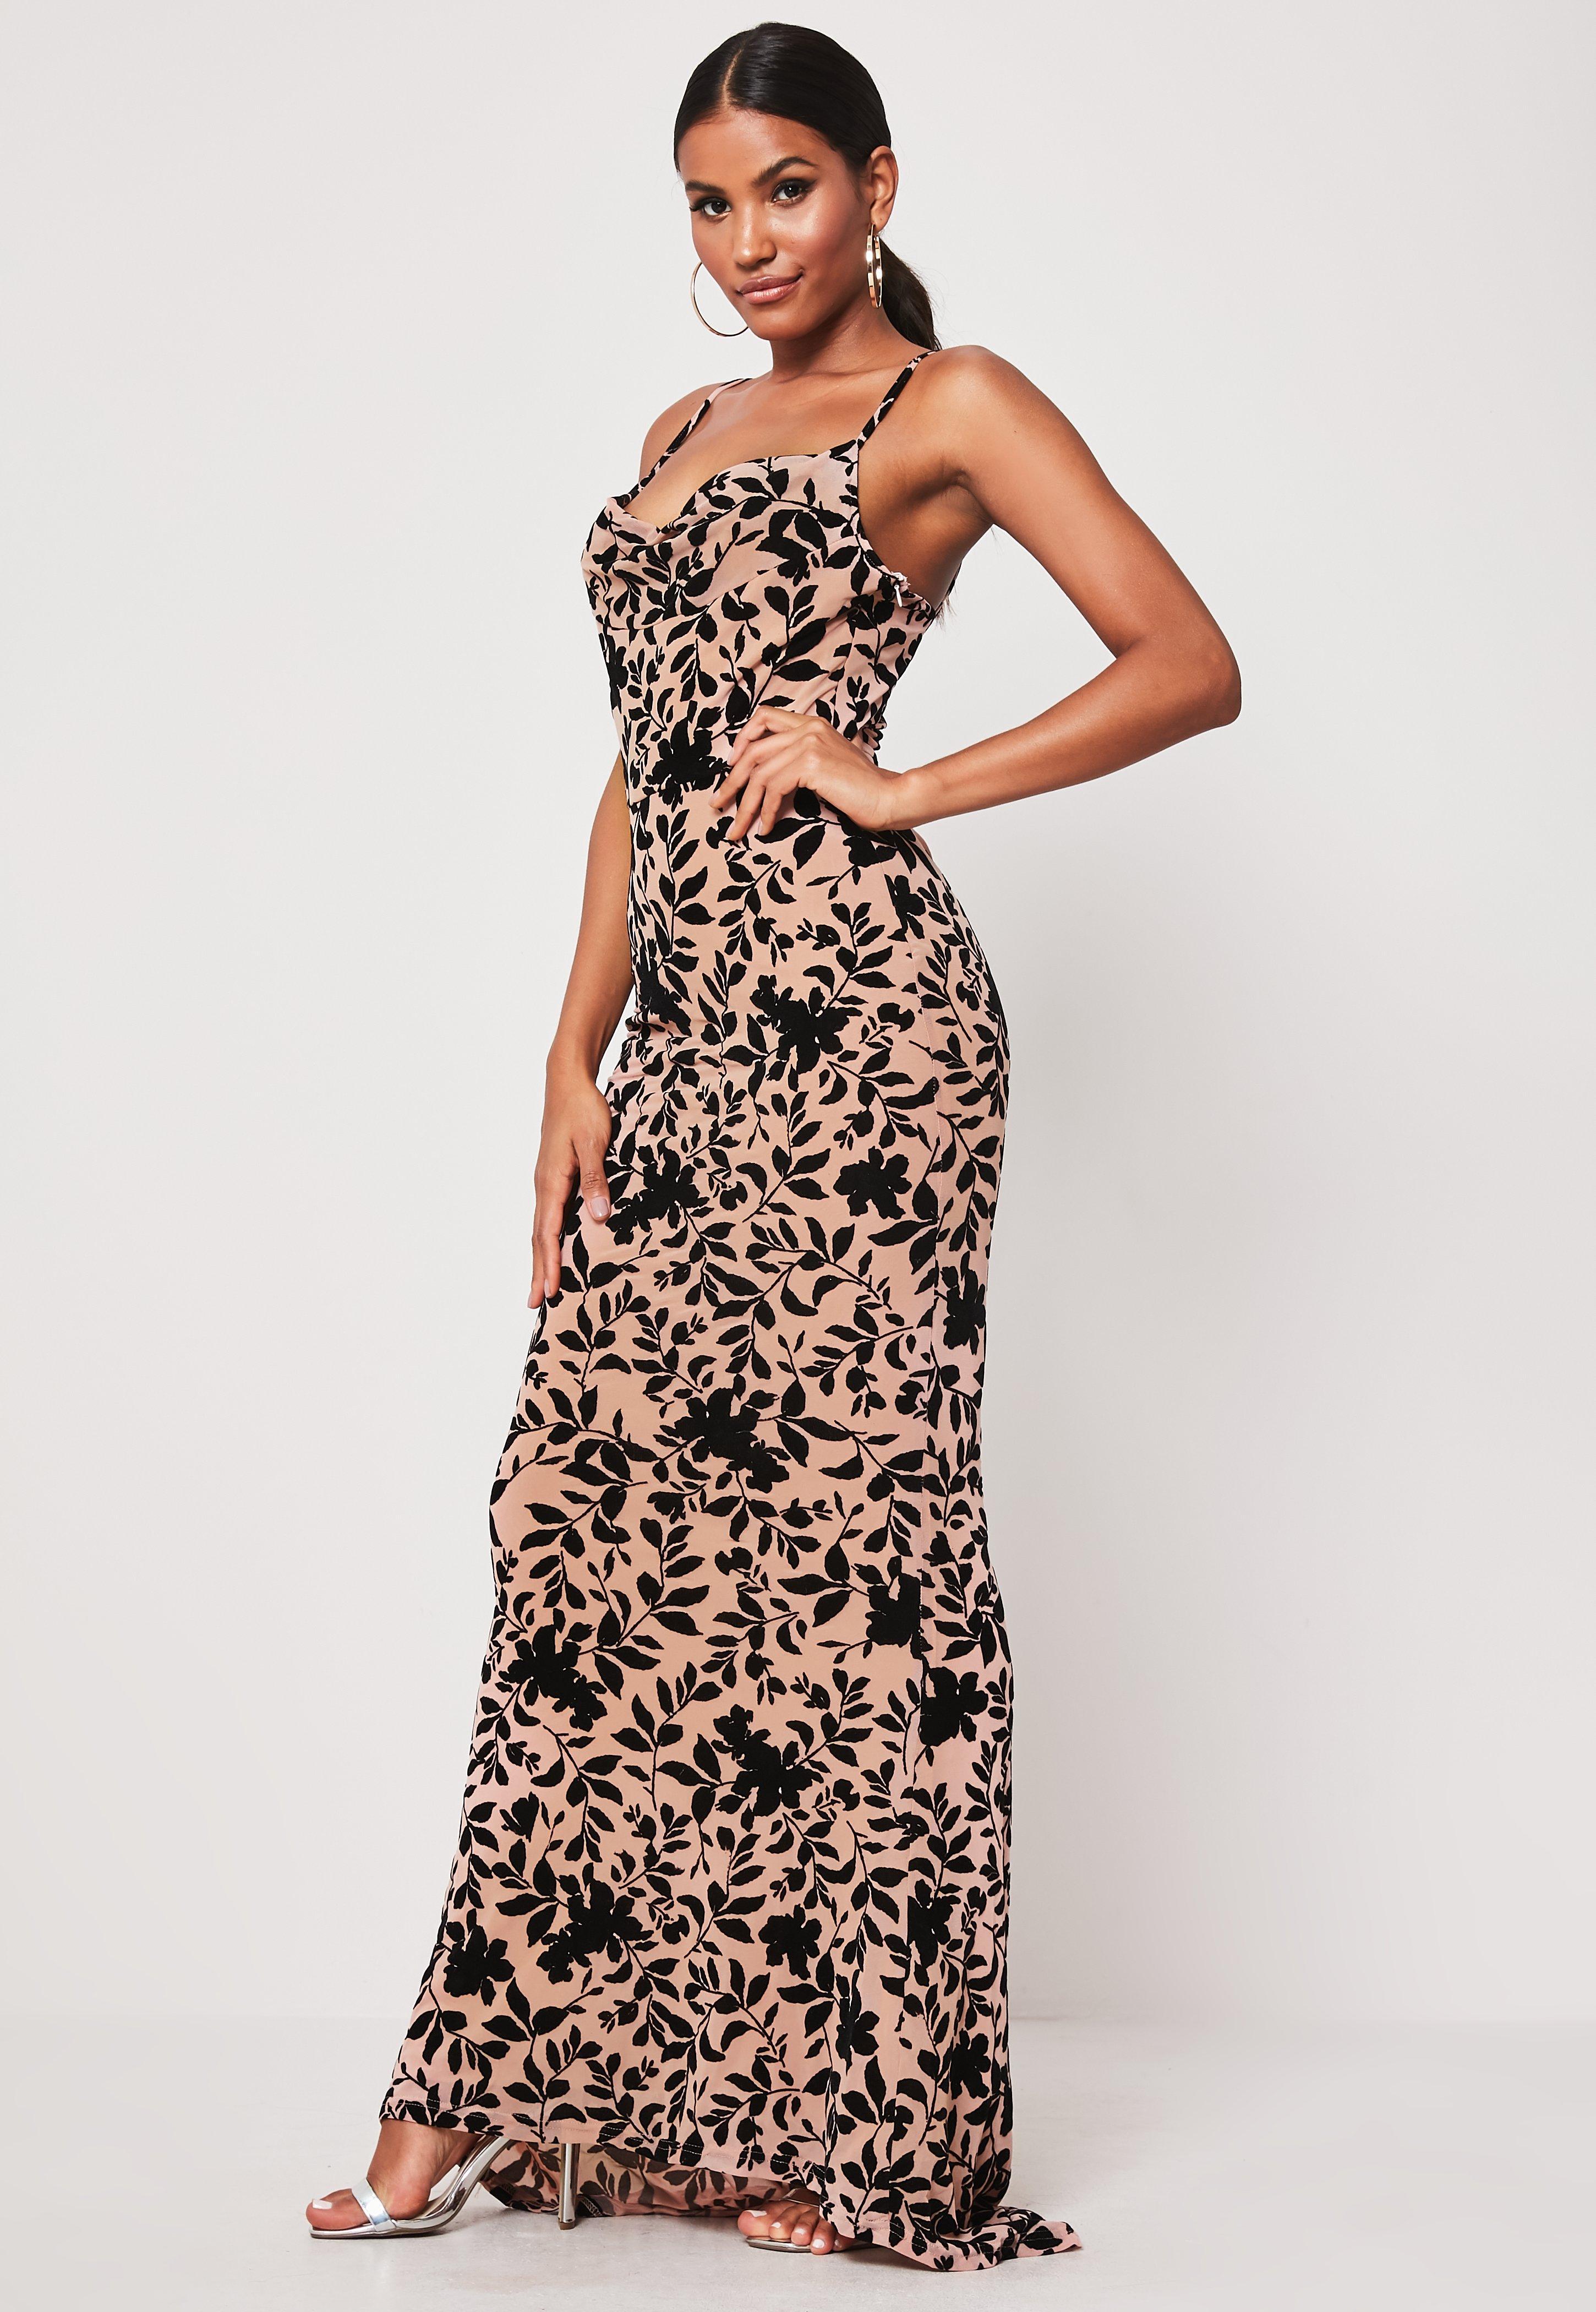 4ce6a71c2c3b Nude Dresses | Beige & Camel Dresses - Missguided Australia